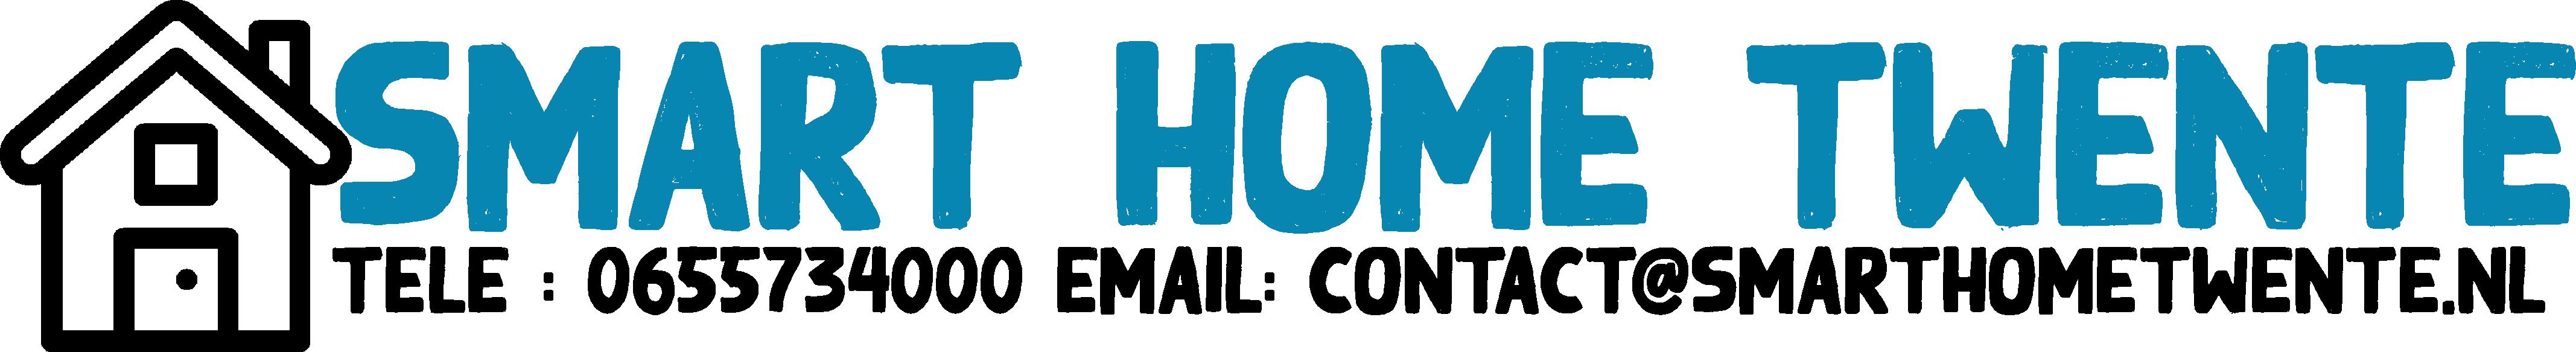 Logo plat met nummer en mail 1.1